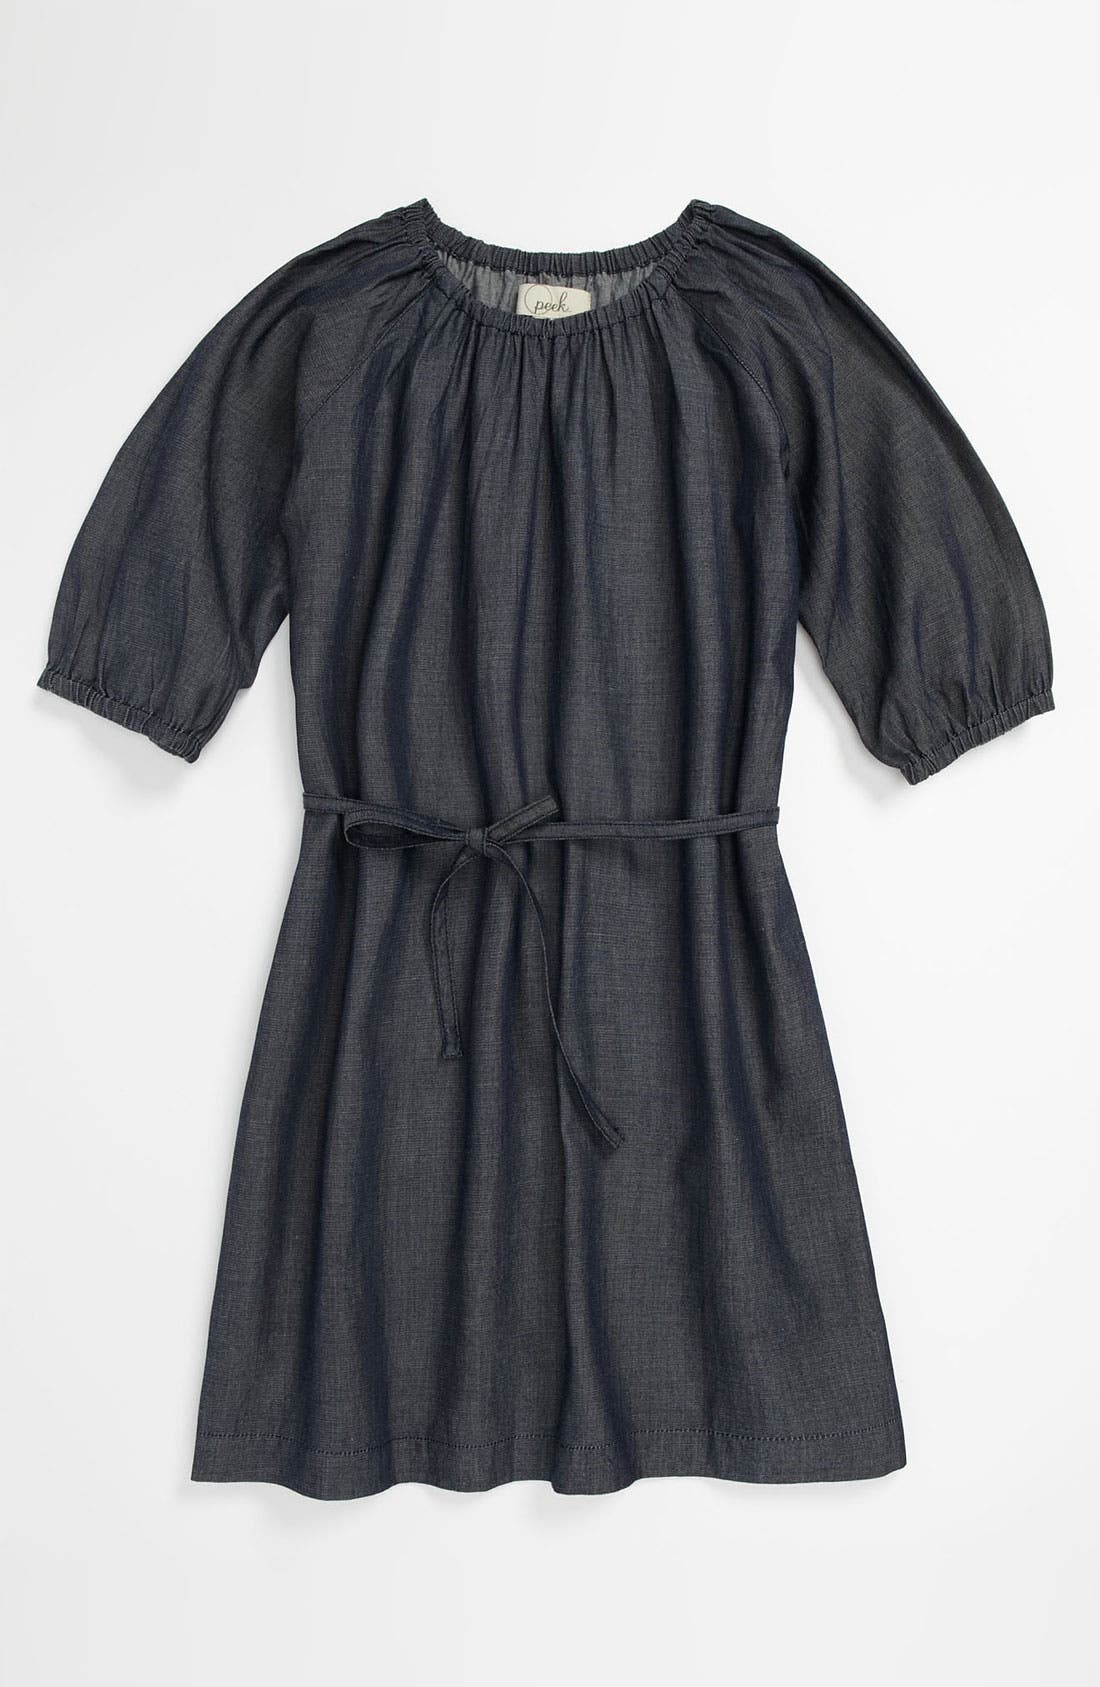 Alternate Image 1 Selected - Peek 'Rosella' Dress (Toddler, Little Girls & Big Girls)